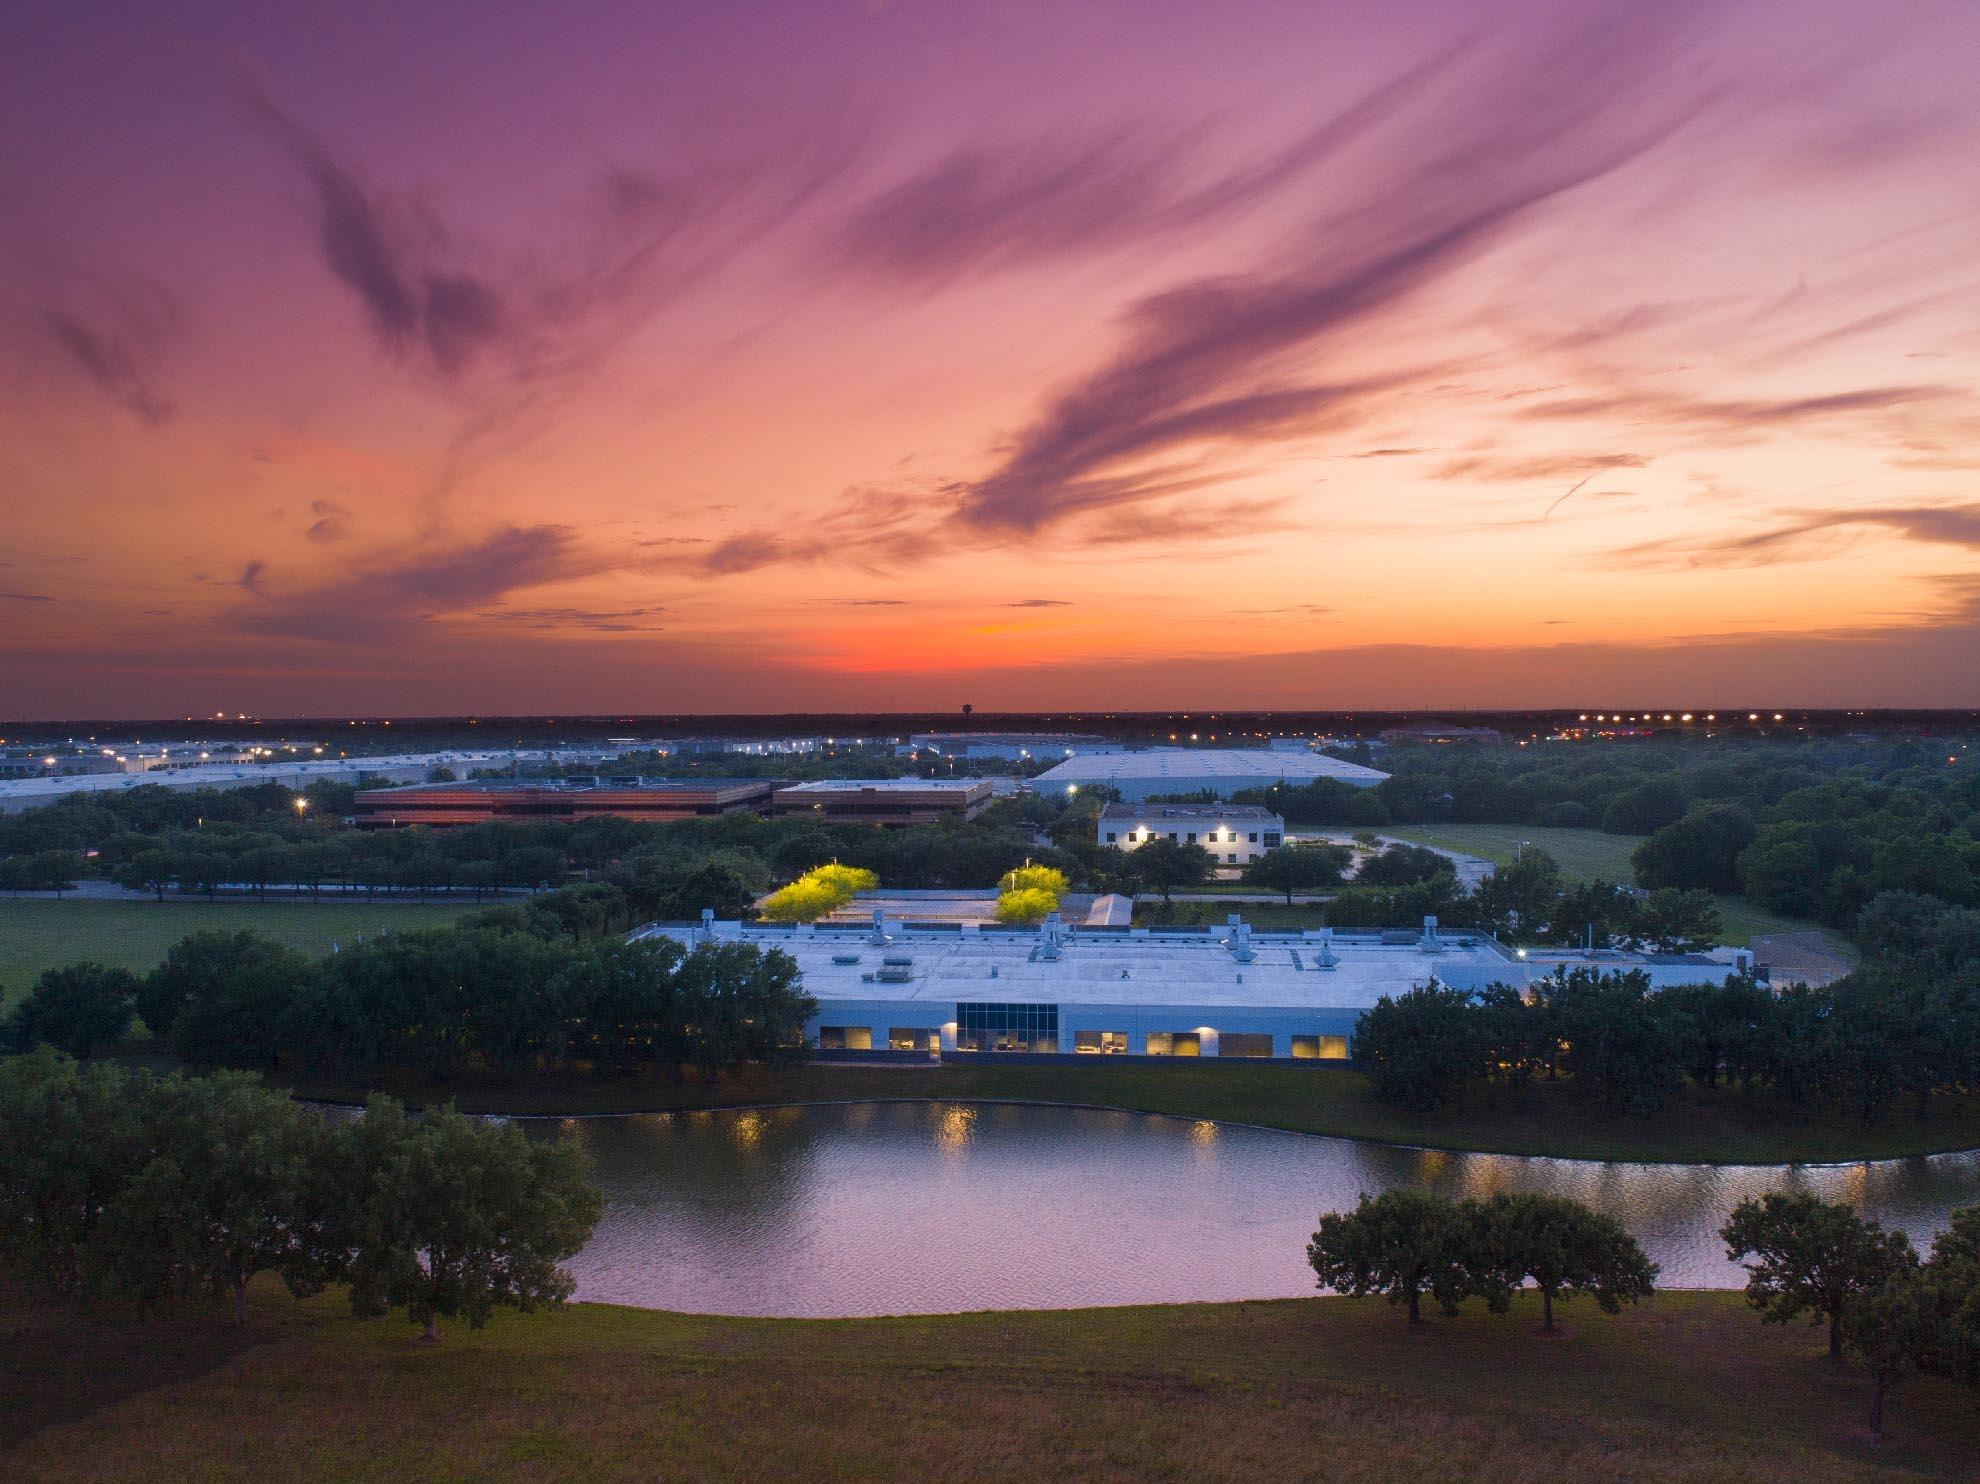 Drone photograph of Sabic facility Sugar Land Texas